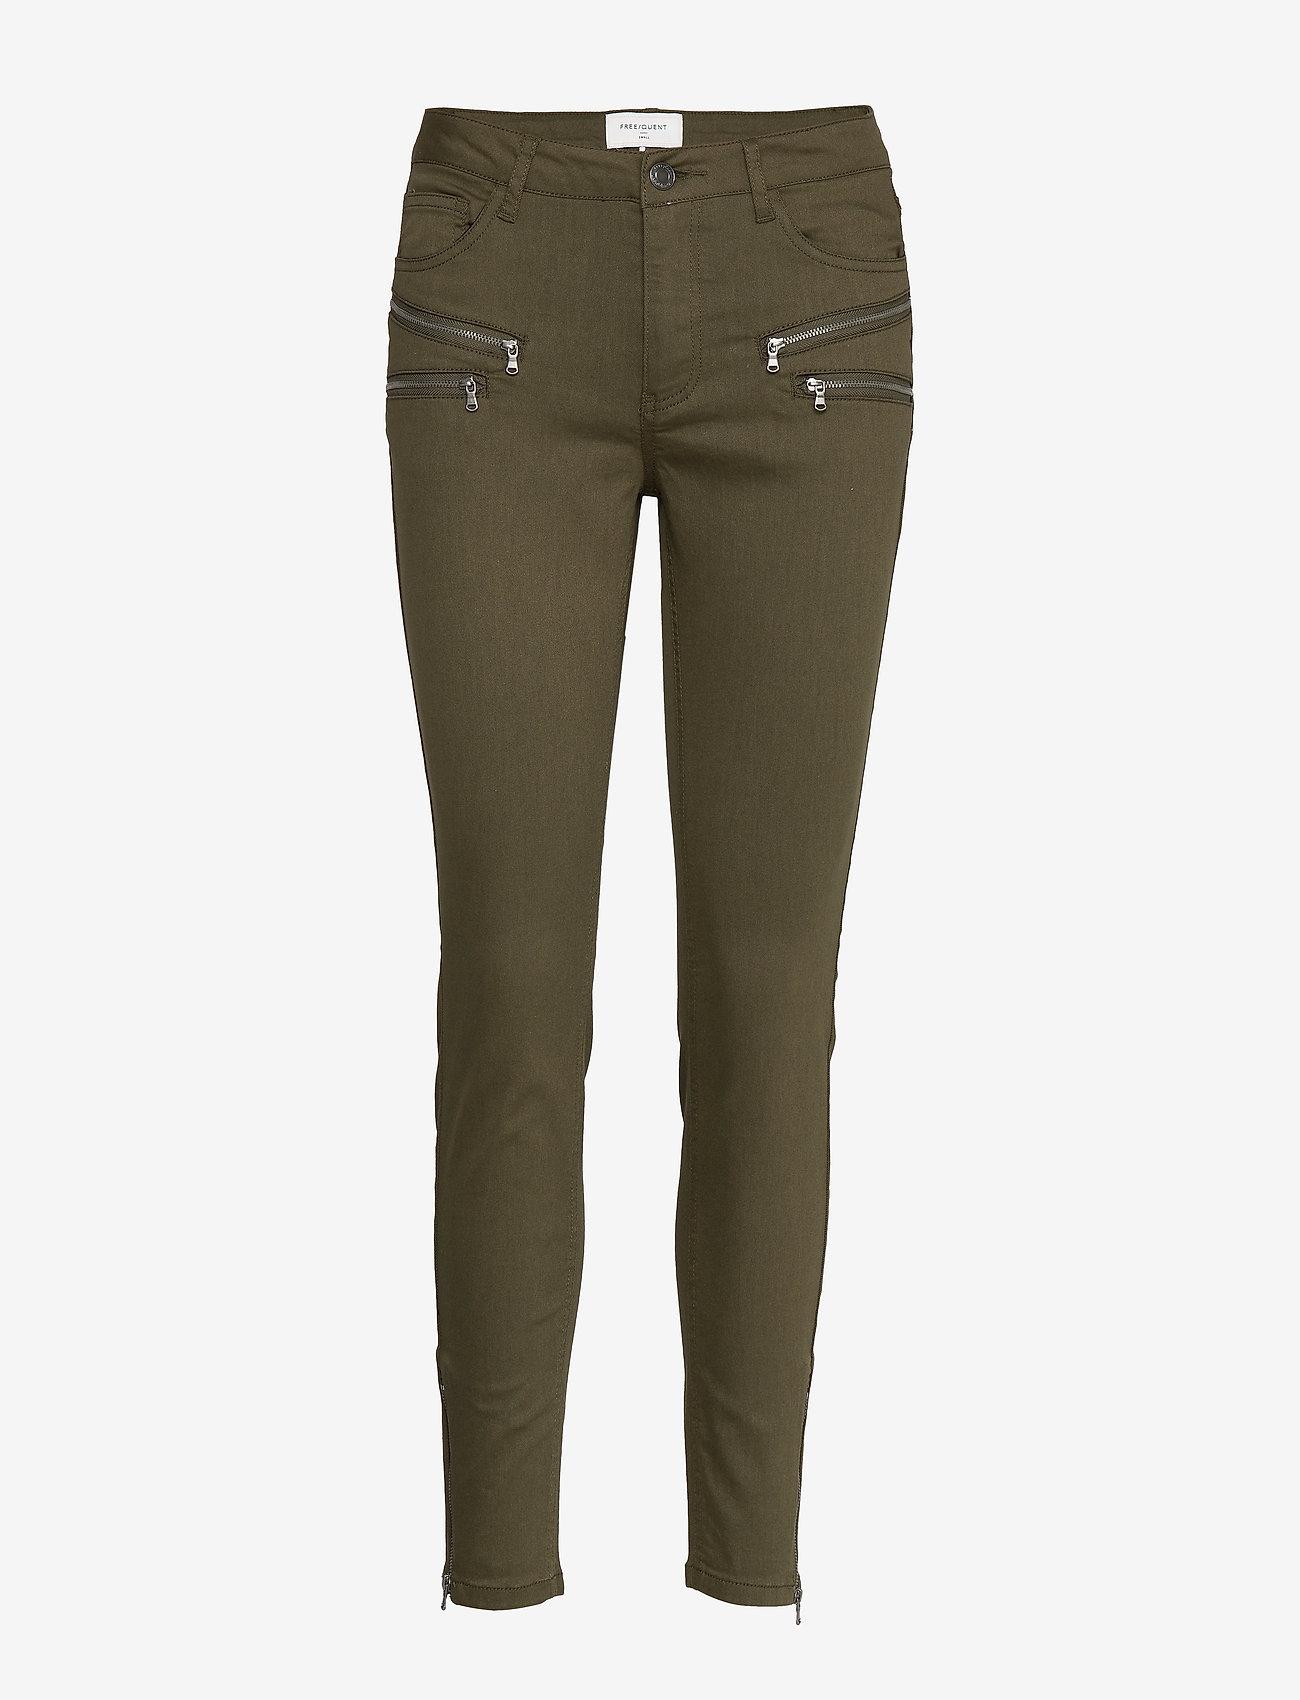 FREE/QUENT - FQAIDA-PA-7/8 - pantalons slim - olive night 19-0515 - 0